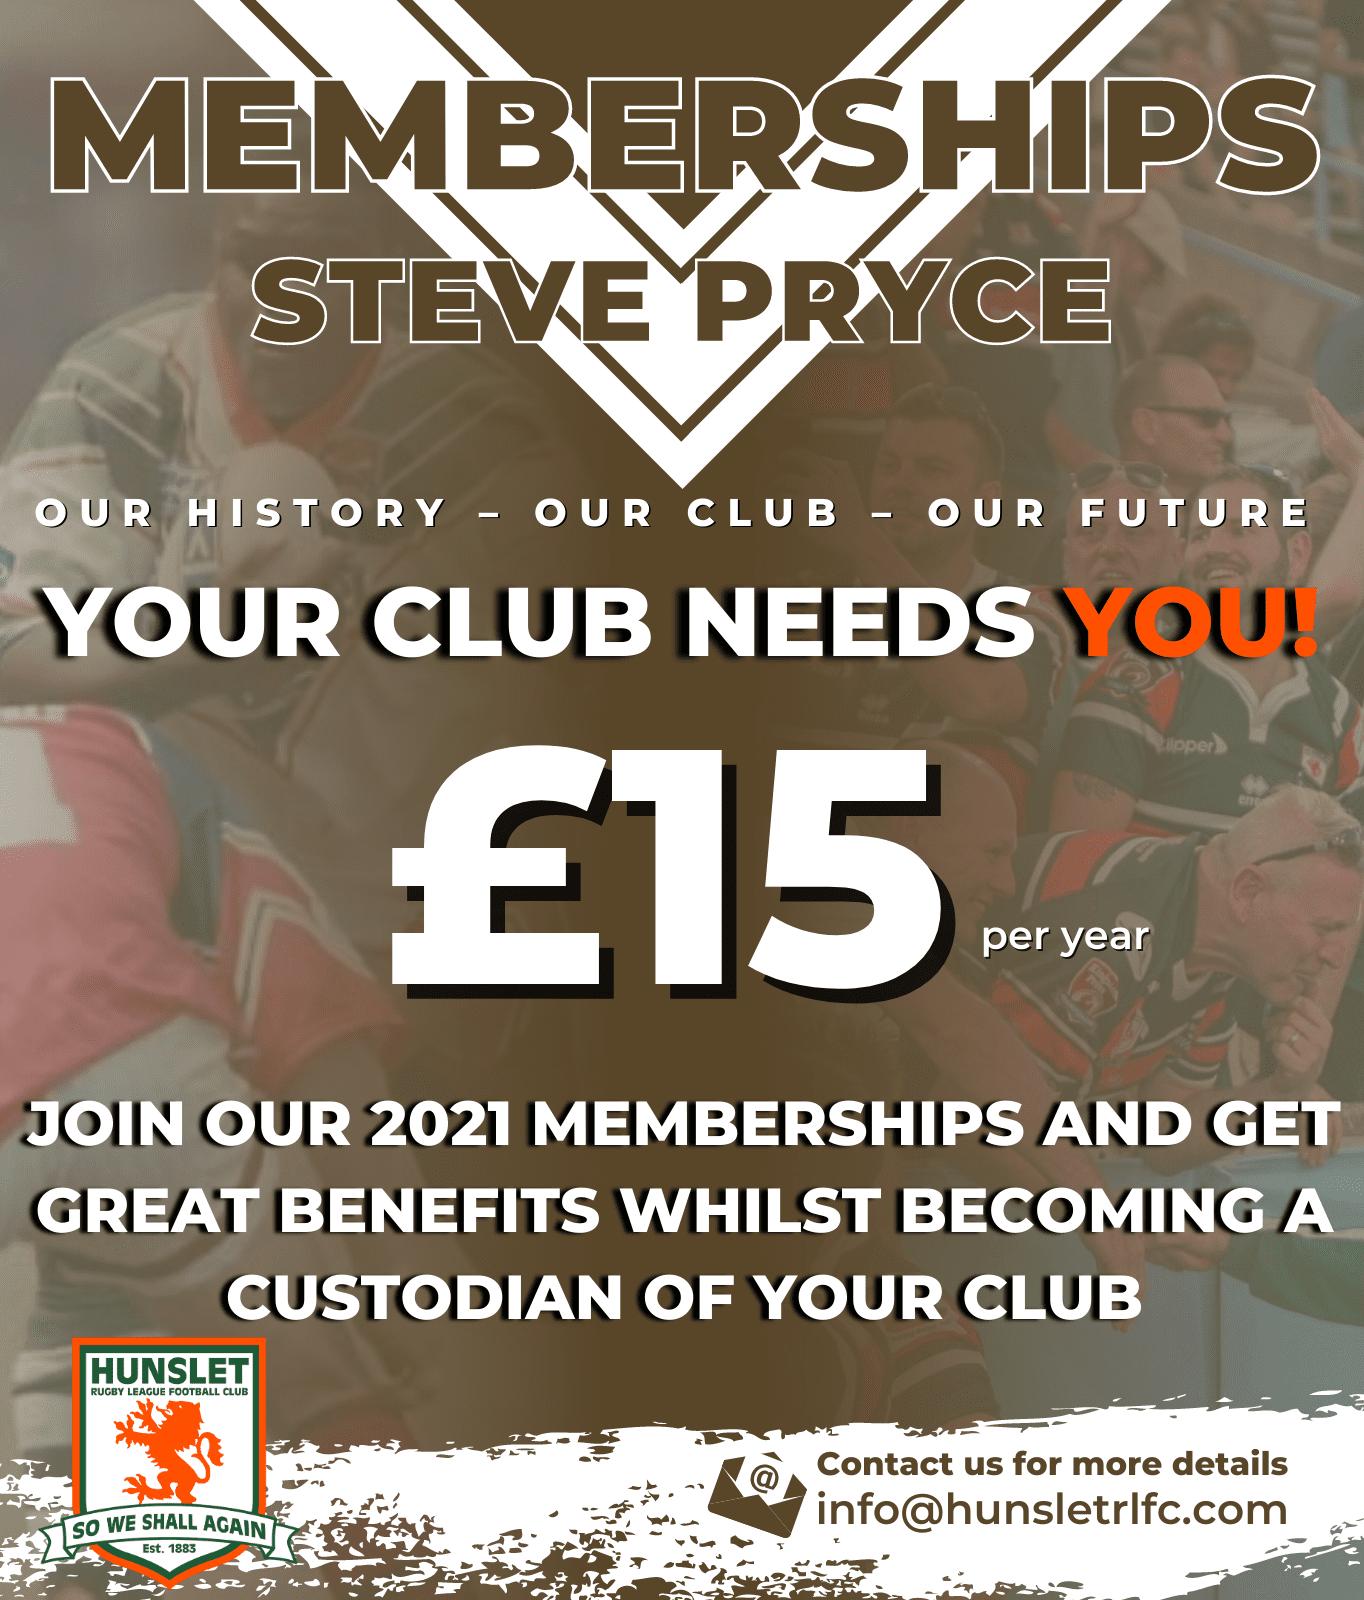 Steve Pryce - Standard membership